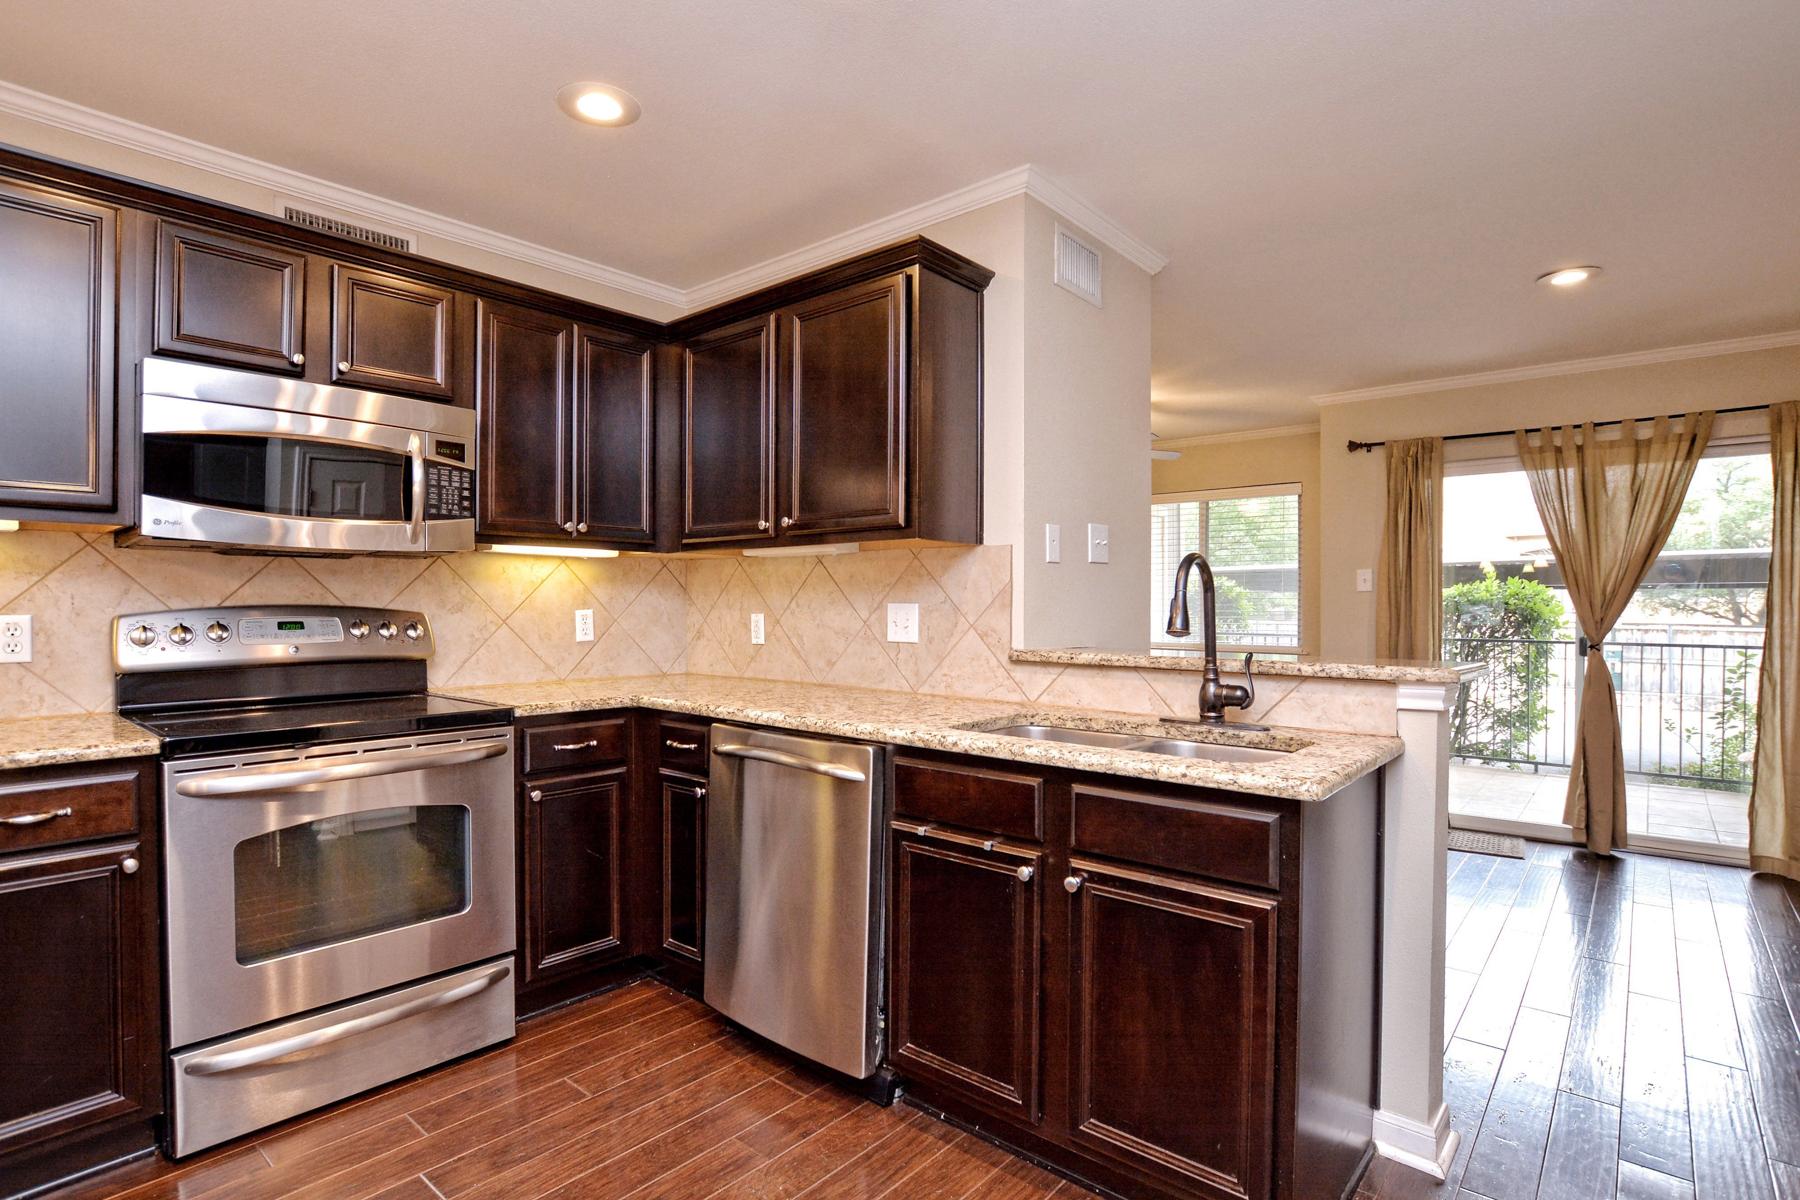 Condominium for Sale at Fantastic Condo in Villa Dijon 100 Lorenz Rd 301 San Antonio, Texas 78209 United States